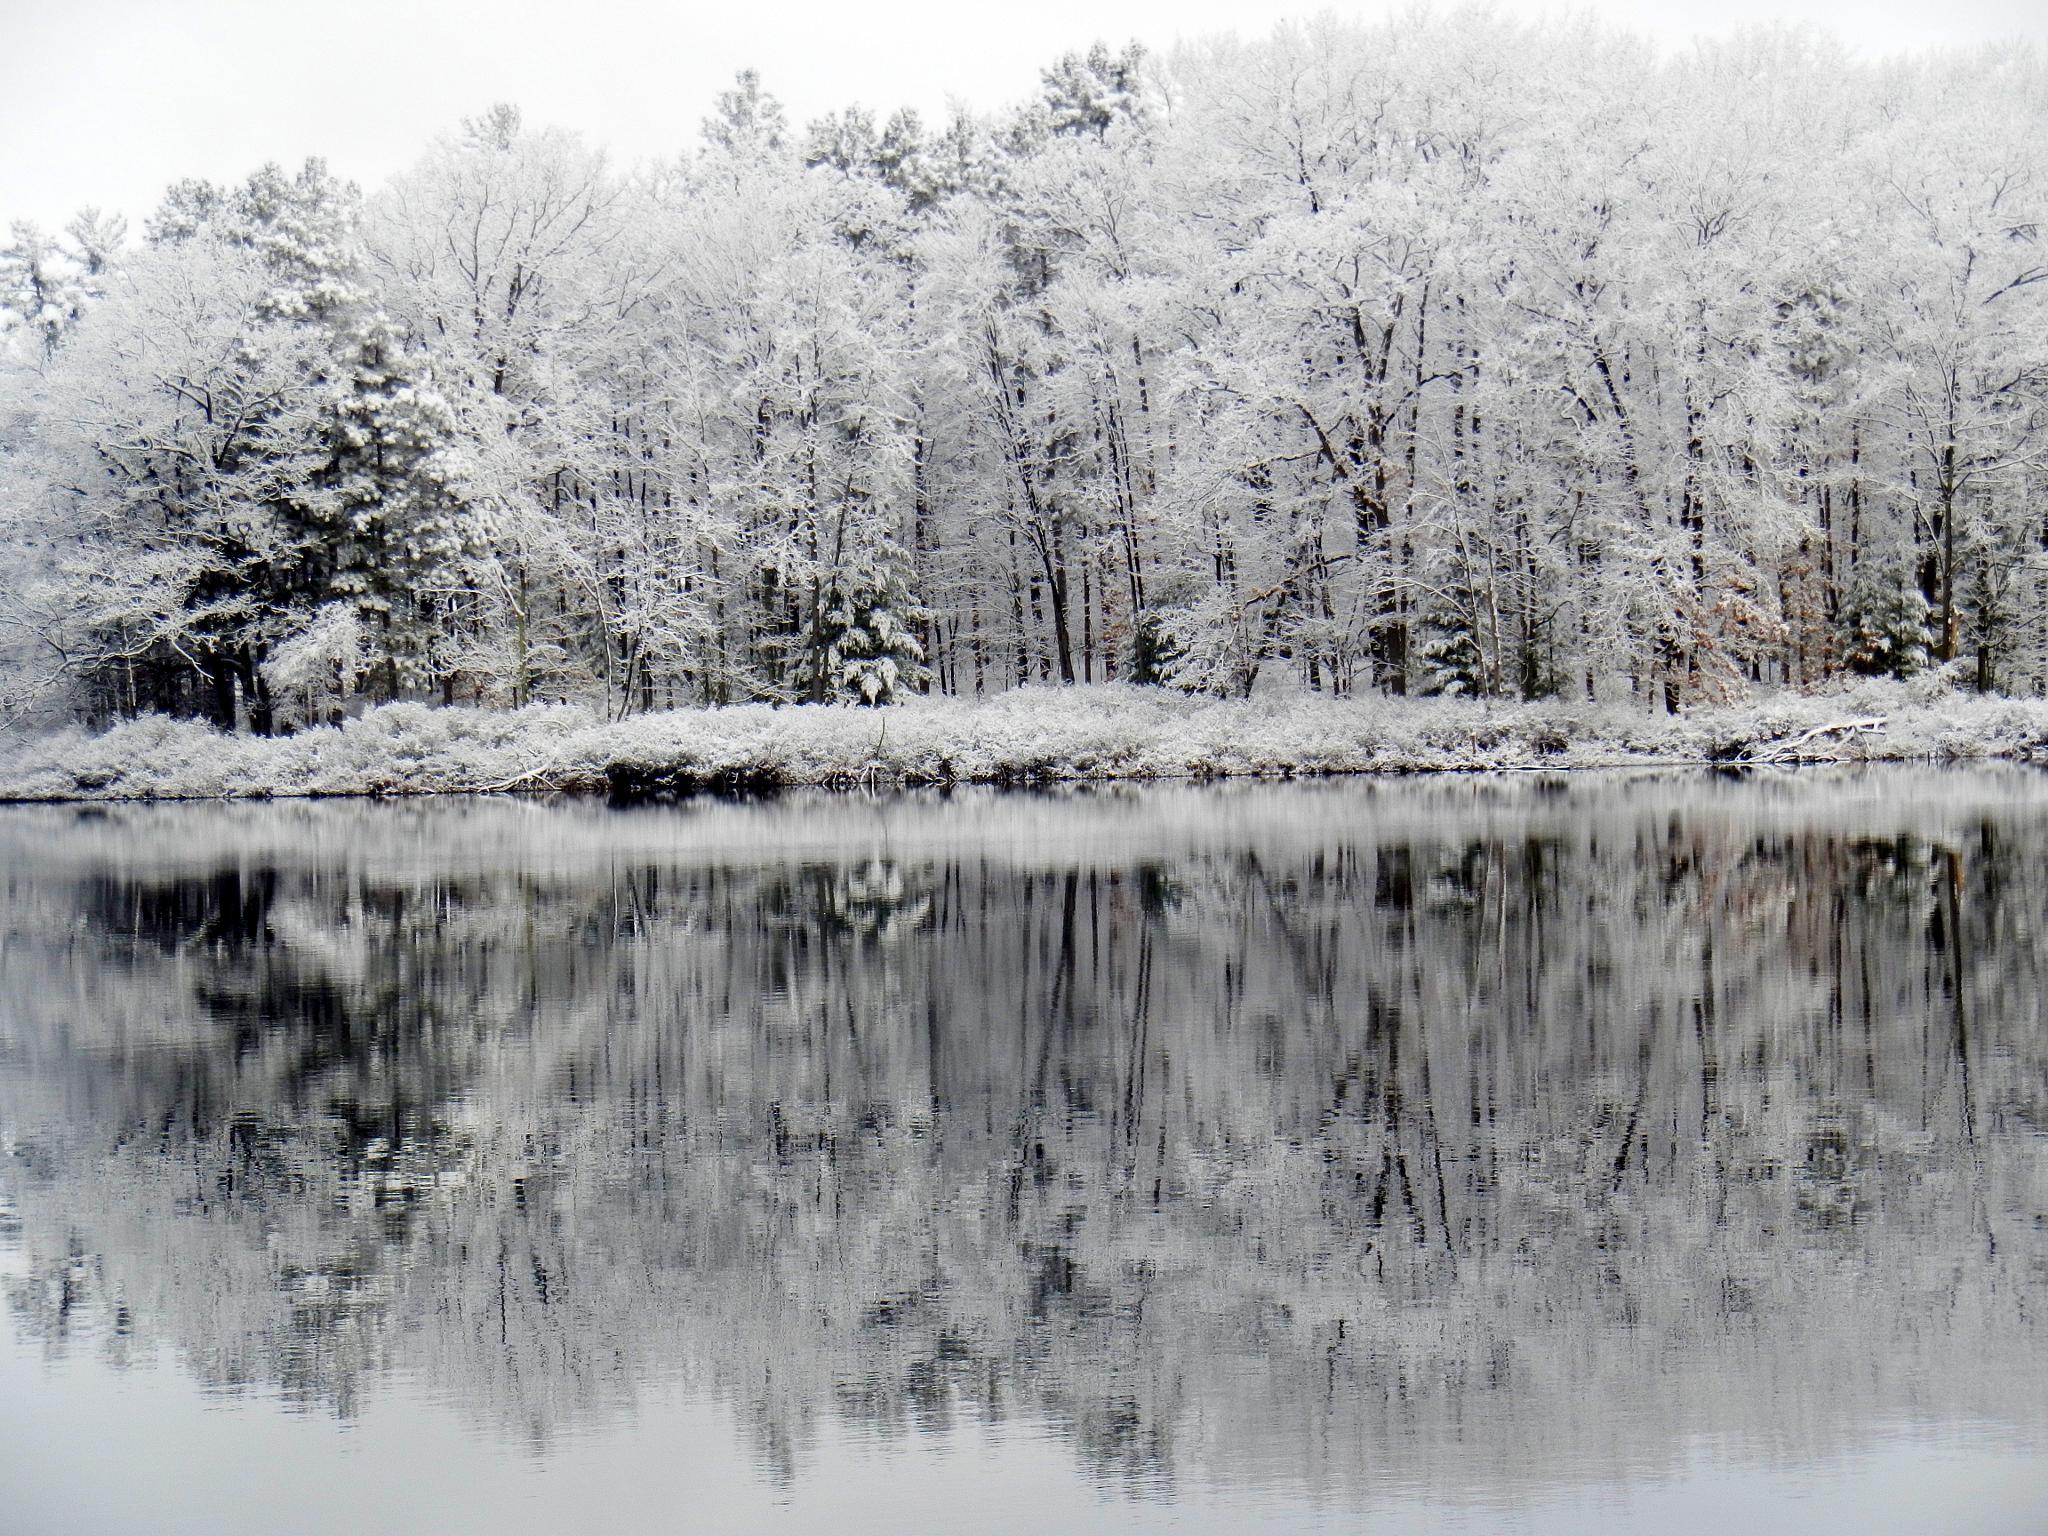 Spring Snow 3/31/15 by lori.dullinger